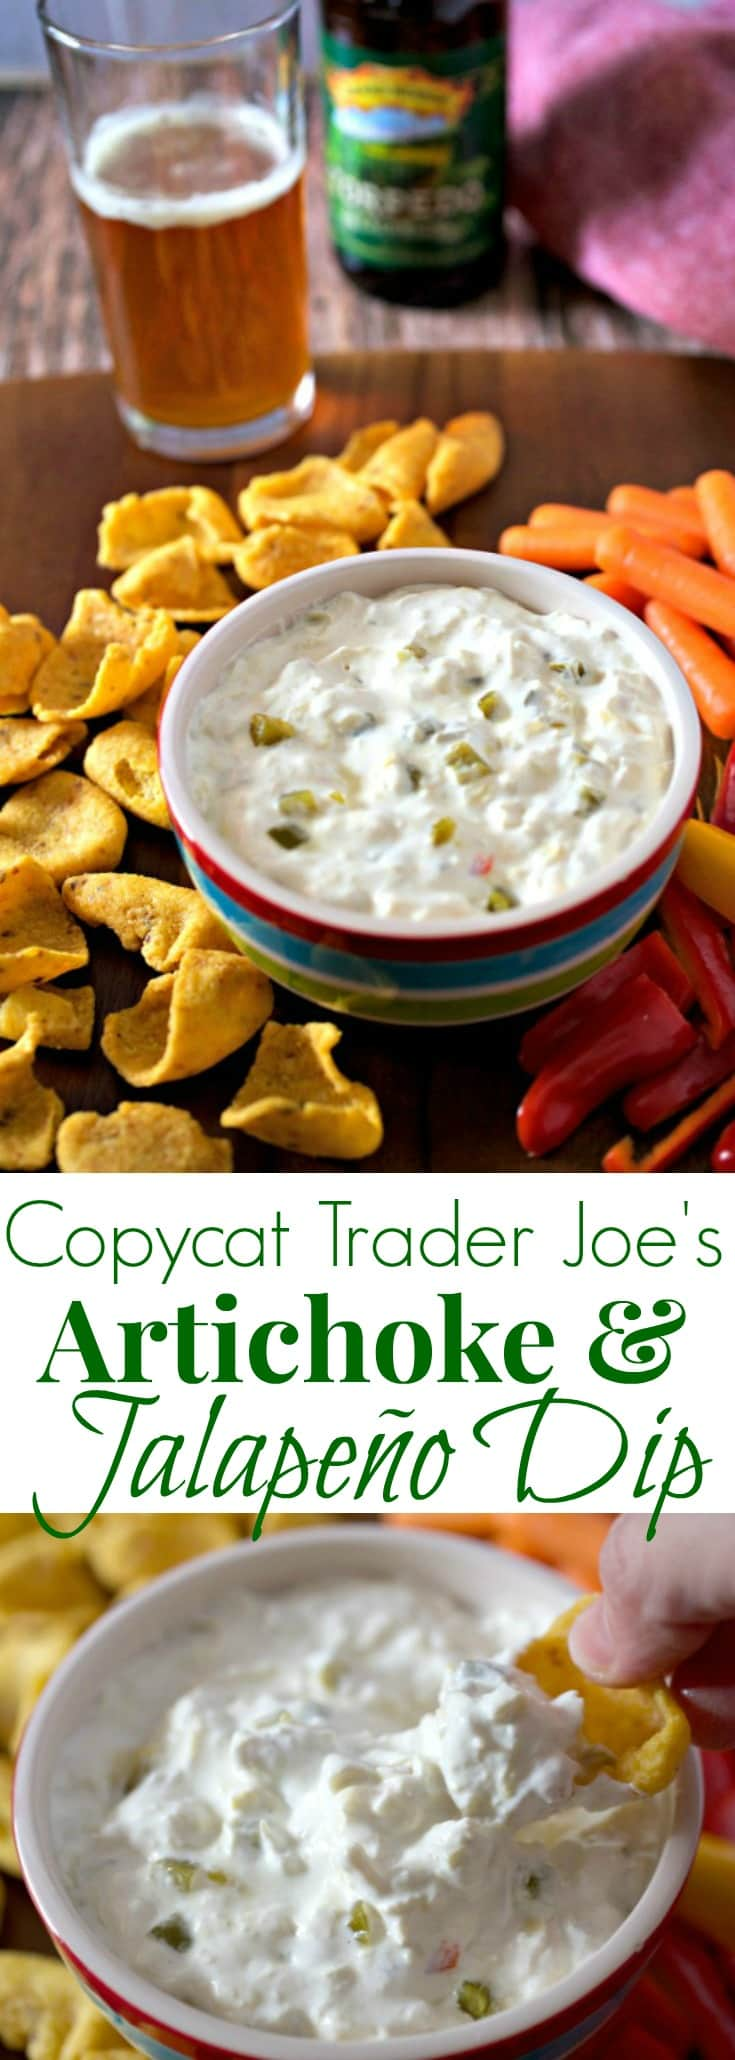 Copycat Trader Joe's Artichoke and Jalapeño Dip